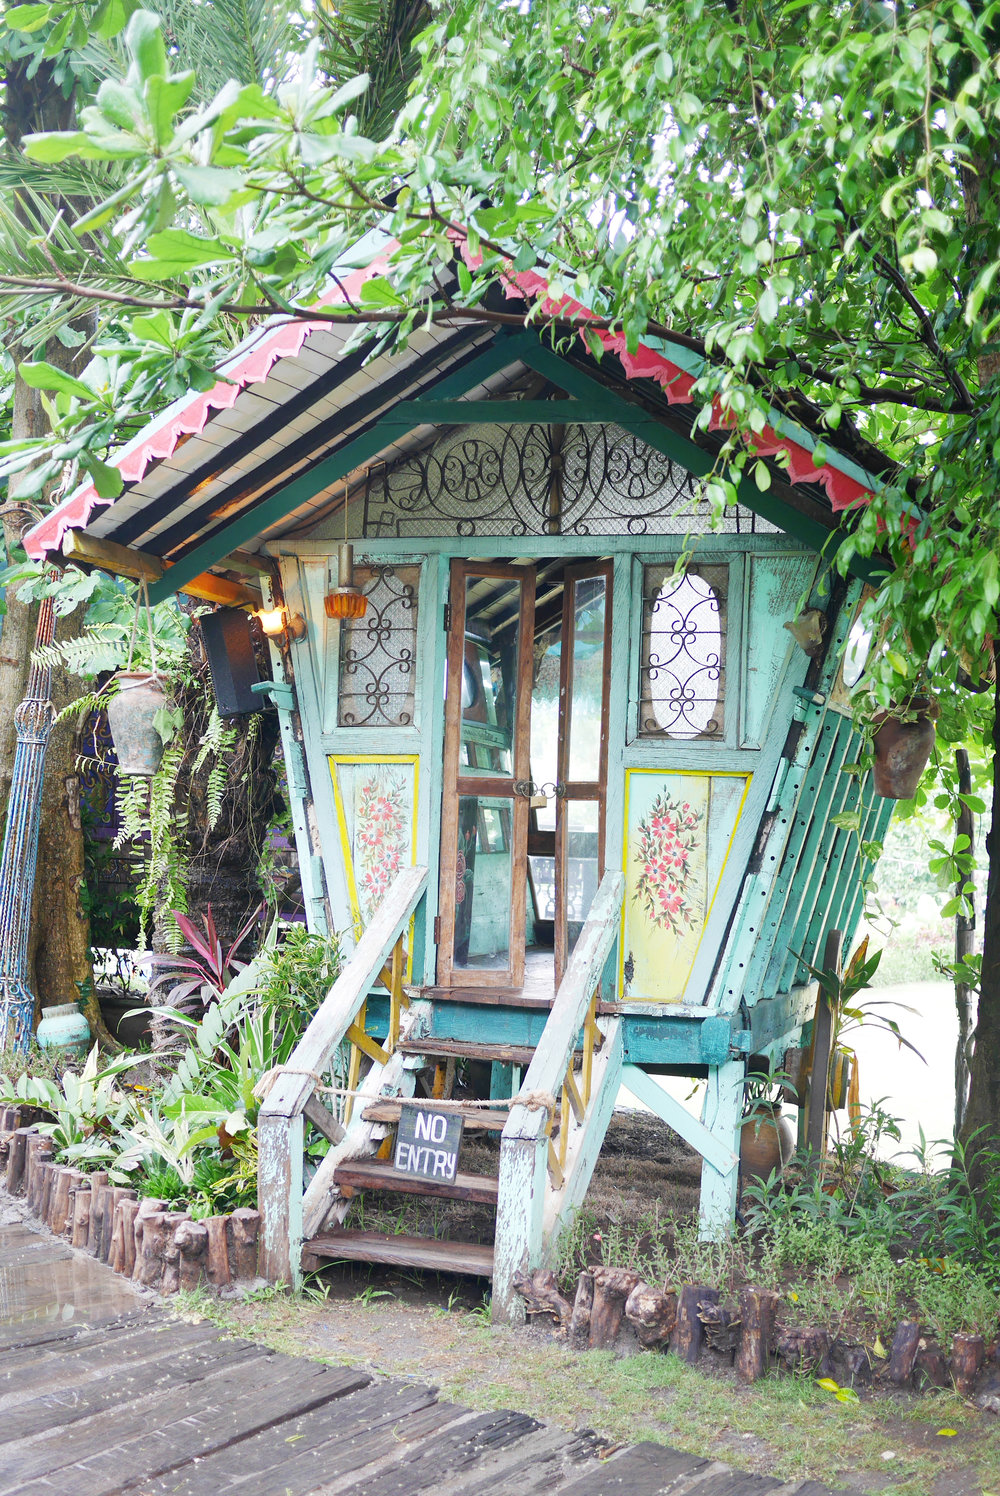 GunawanMelisa_Bali15_LaLaguna